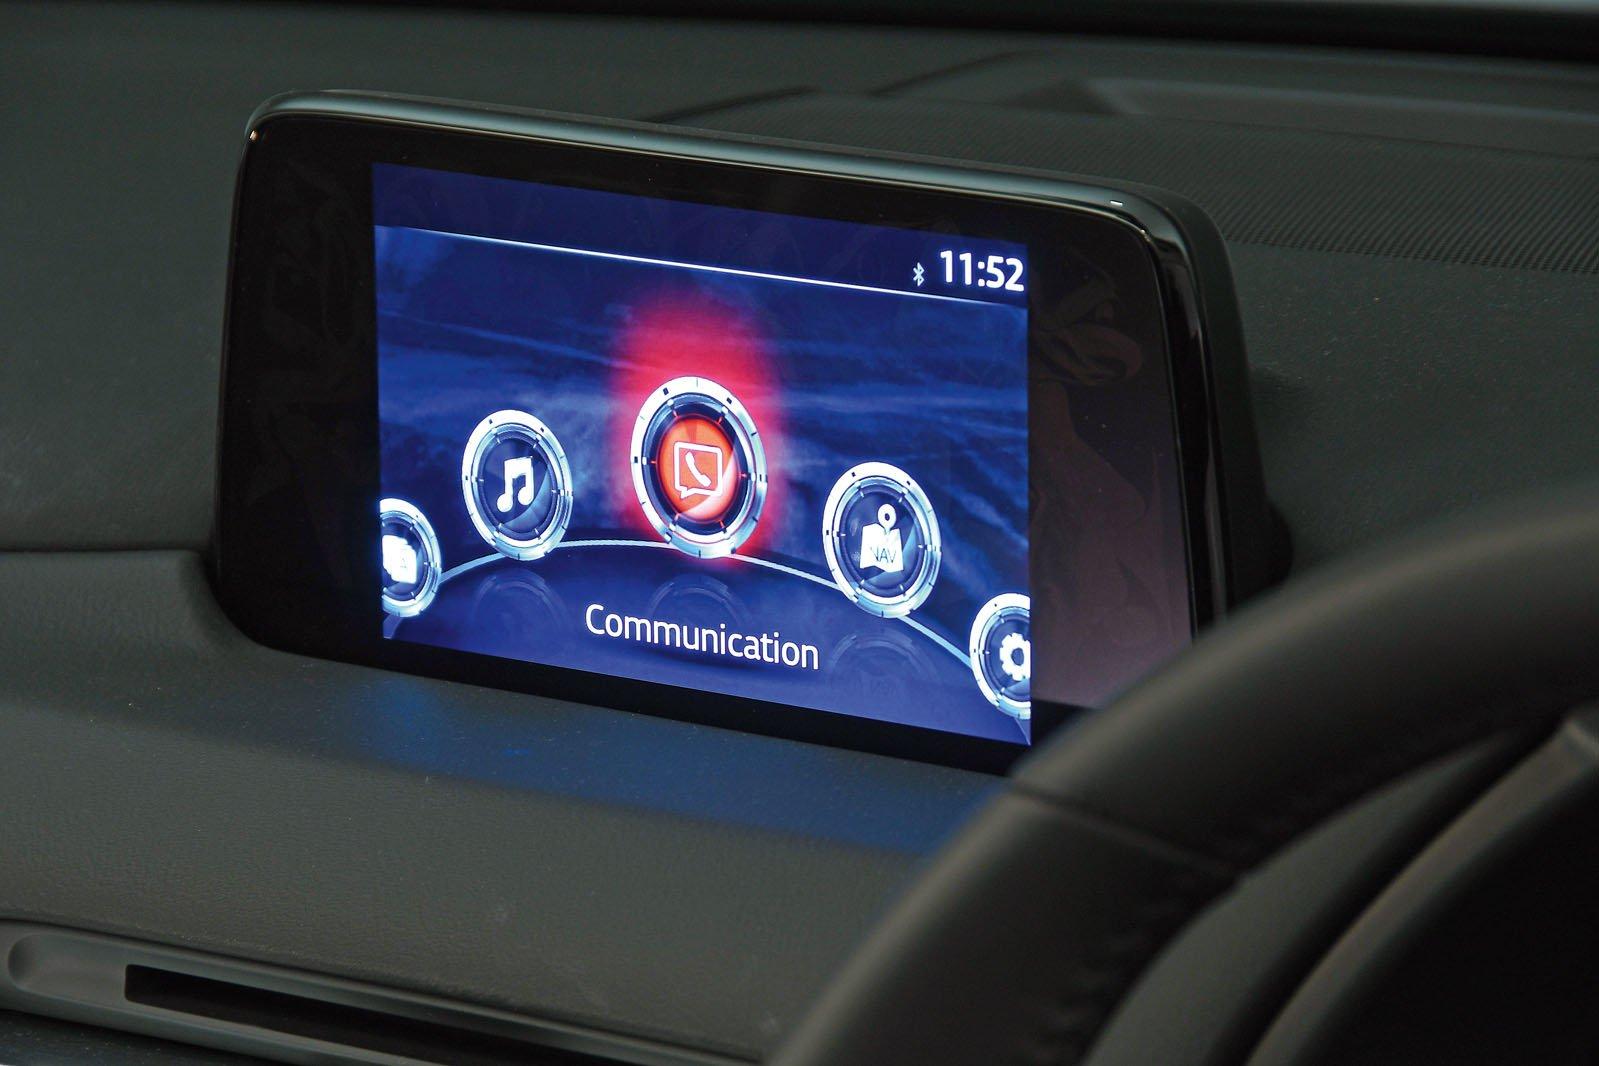 Mazda CX-5 infotainment